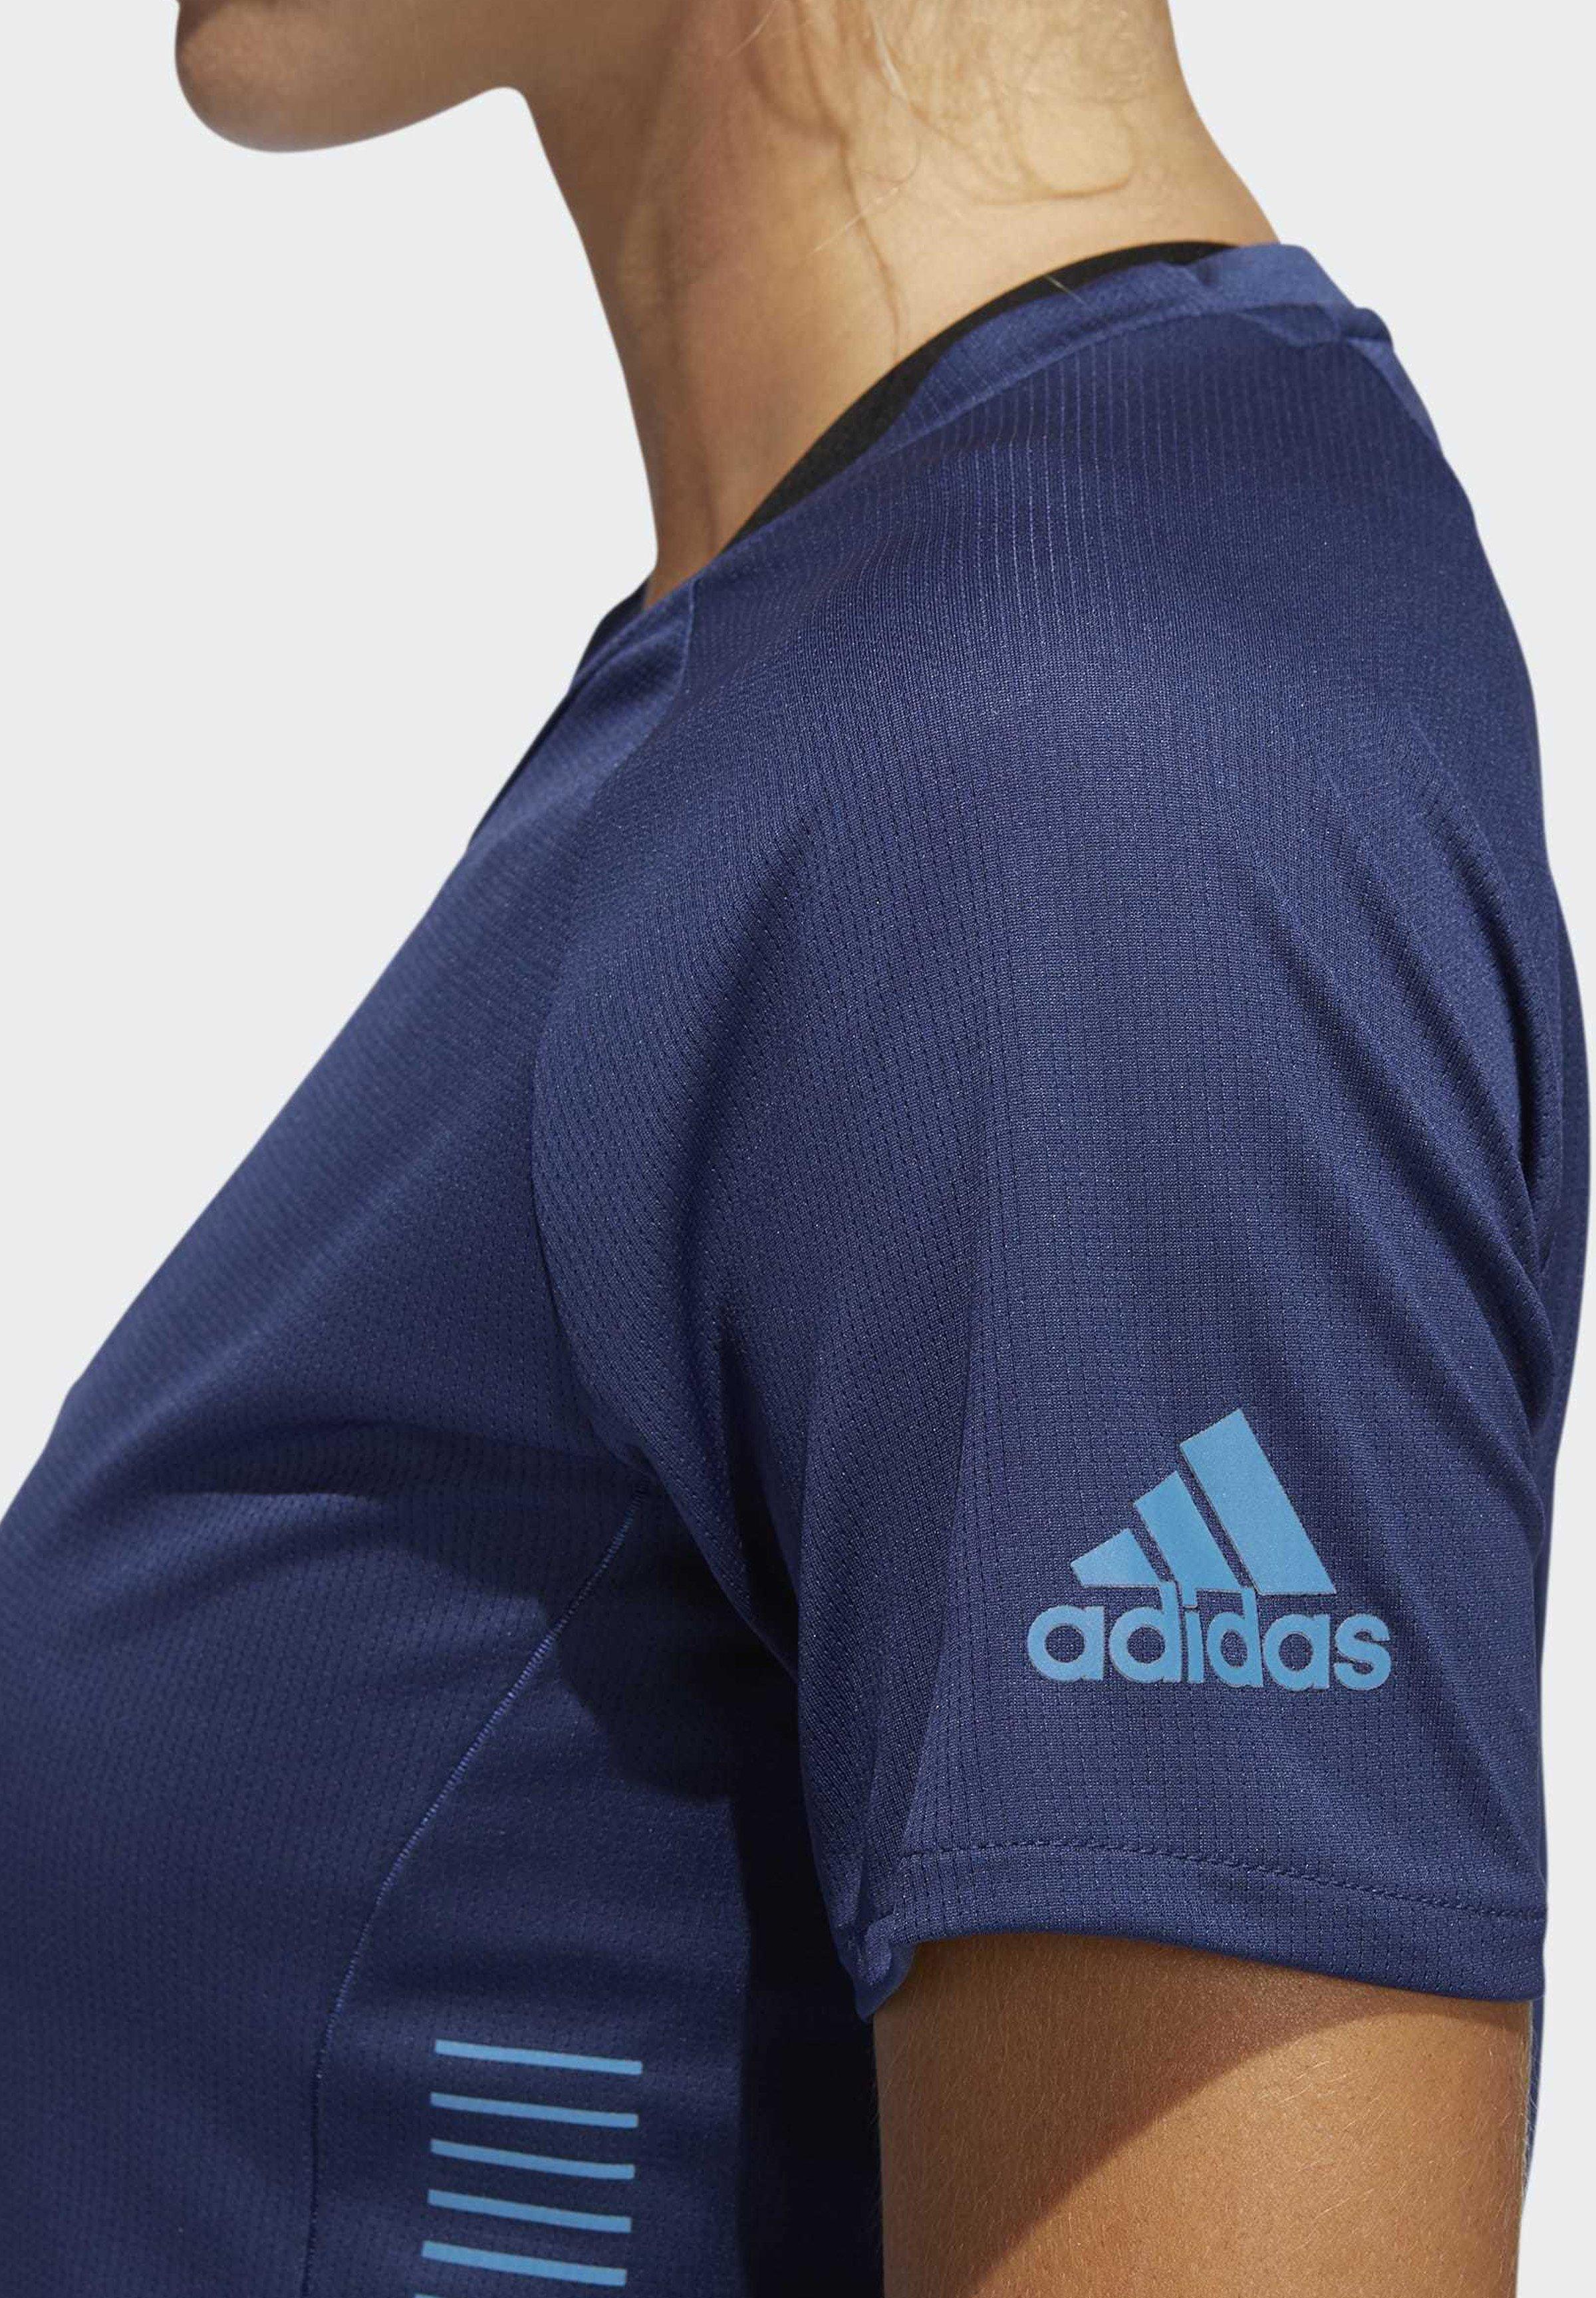 Adidas Performance Rise Up N Run Parley T-shirt - Med Print Tech Indigo